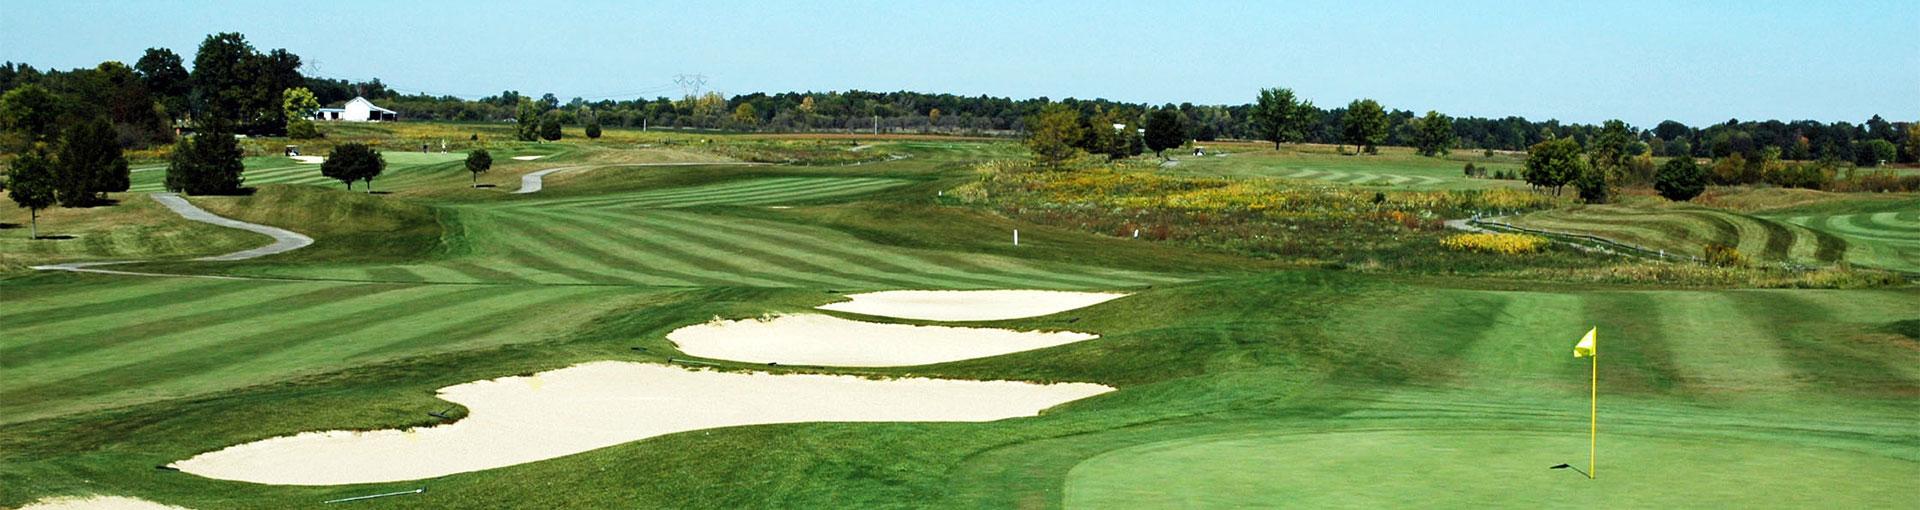 Columbus, Ohio golf courses - Central Ohio Golf Courses